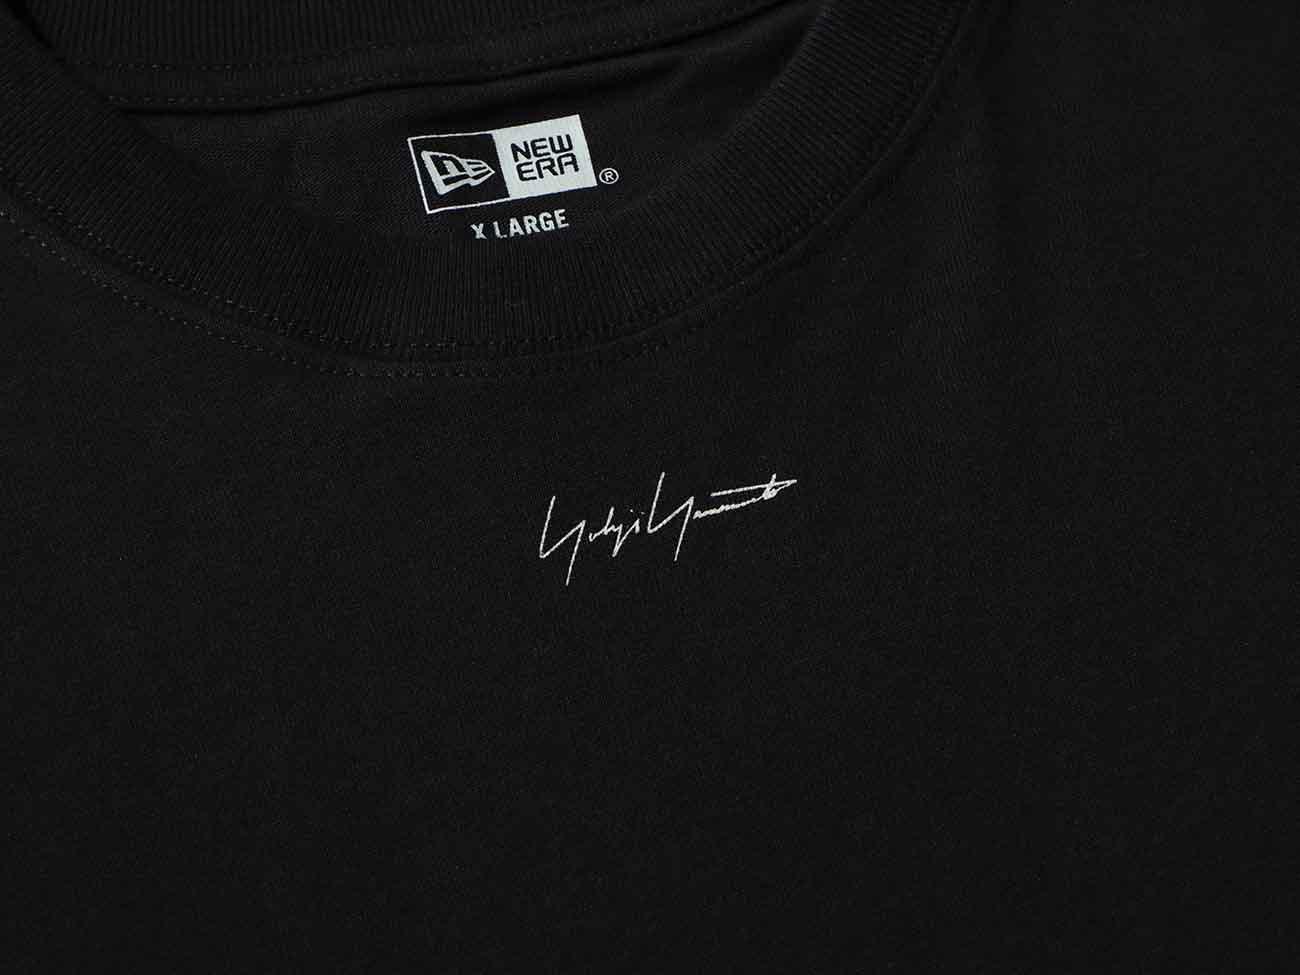 Yohji Yamamoto × New Era MINI LOGO S/S COTTON TEE